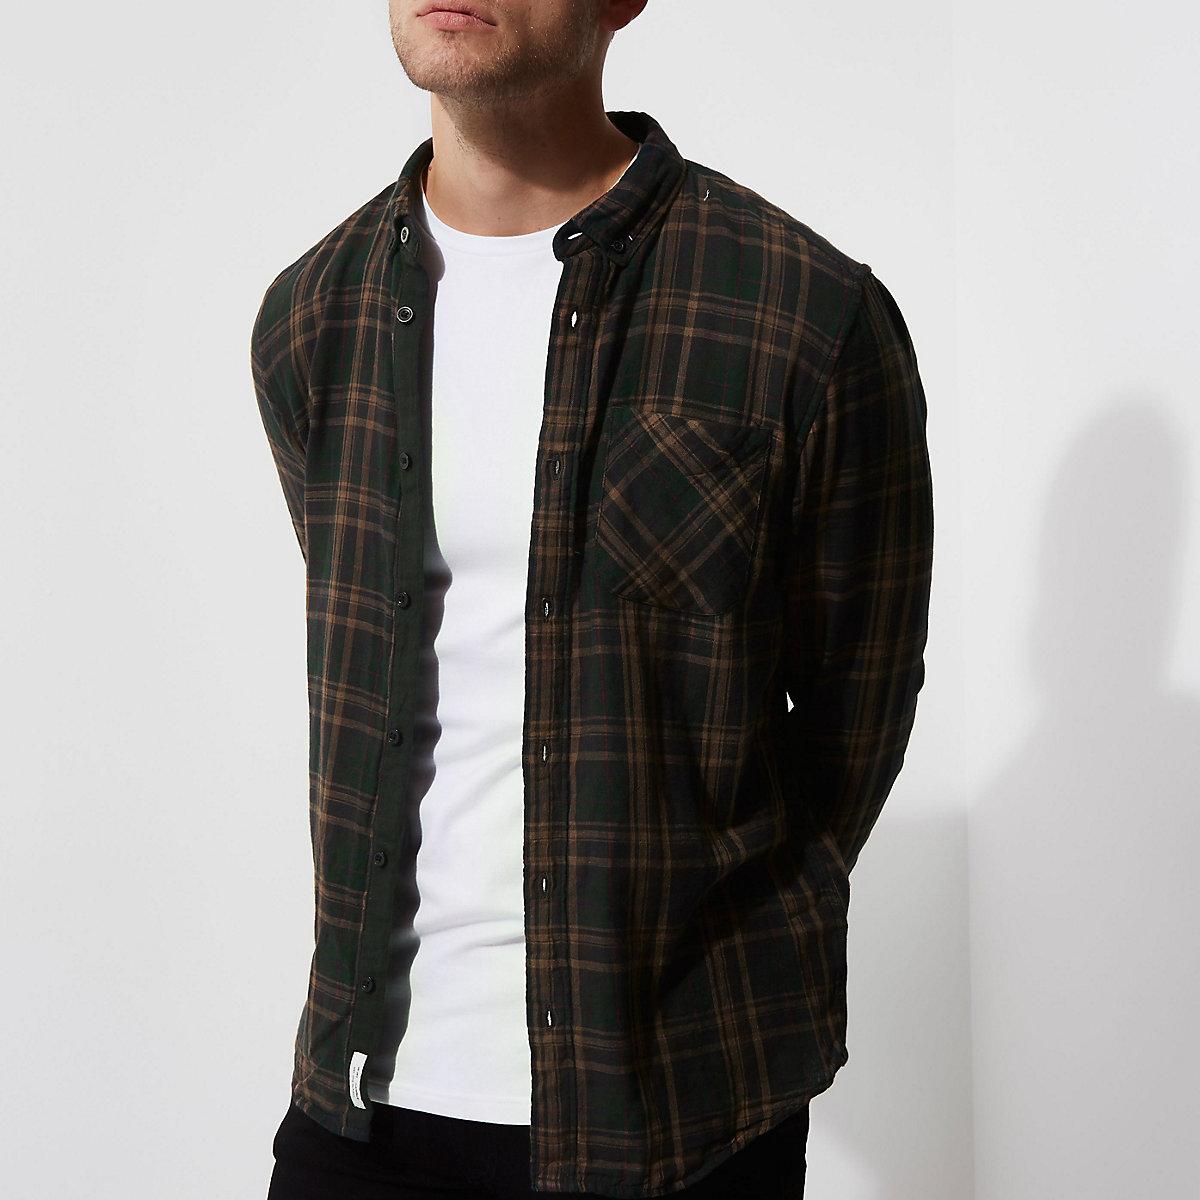 Green double face check long sleeve shirt